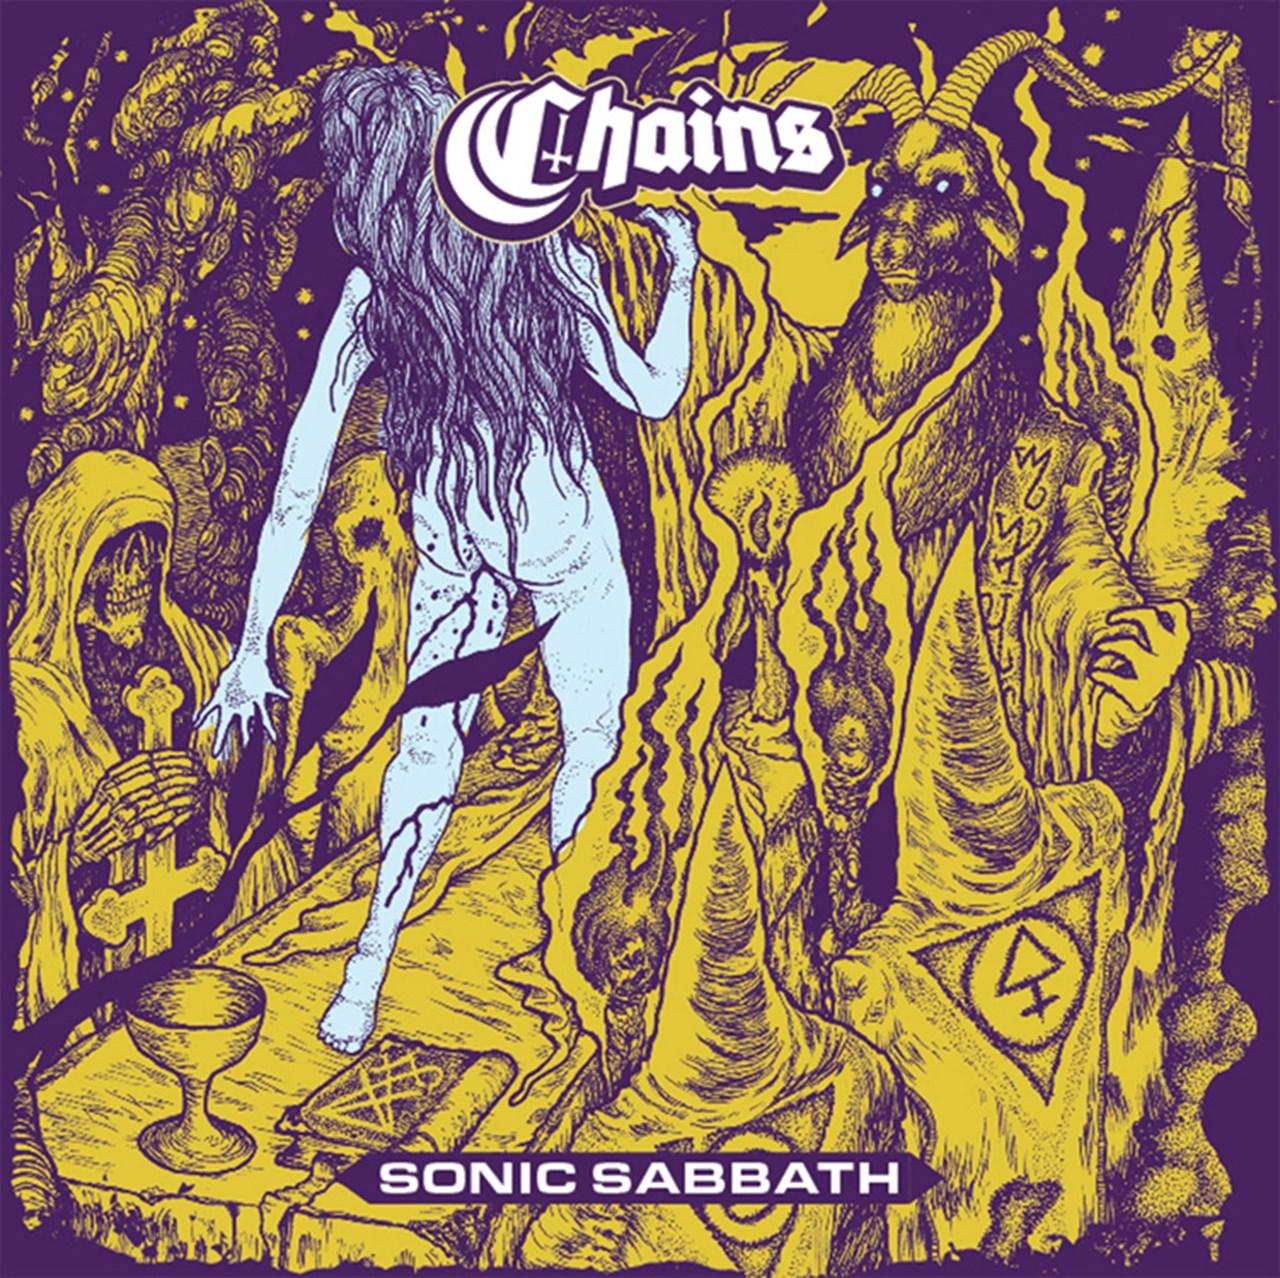 Sonic Sabbath - 1